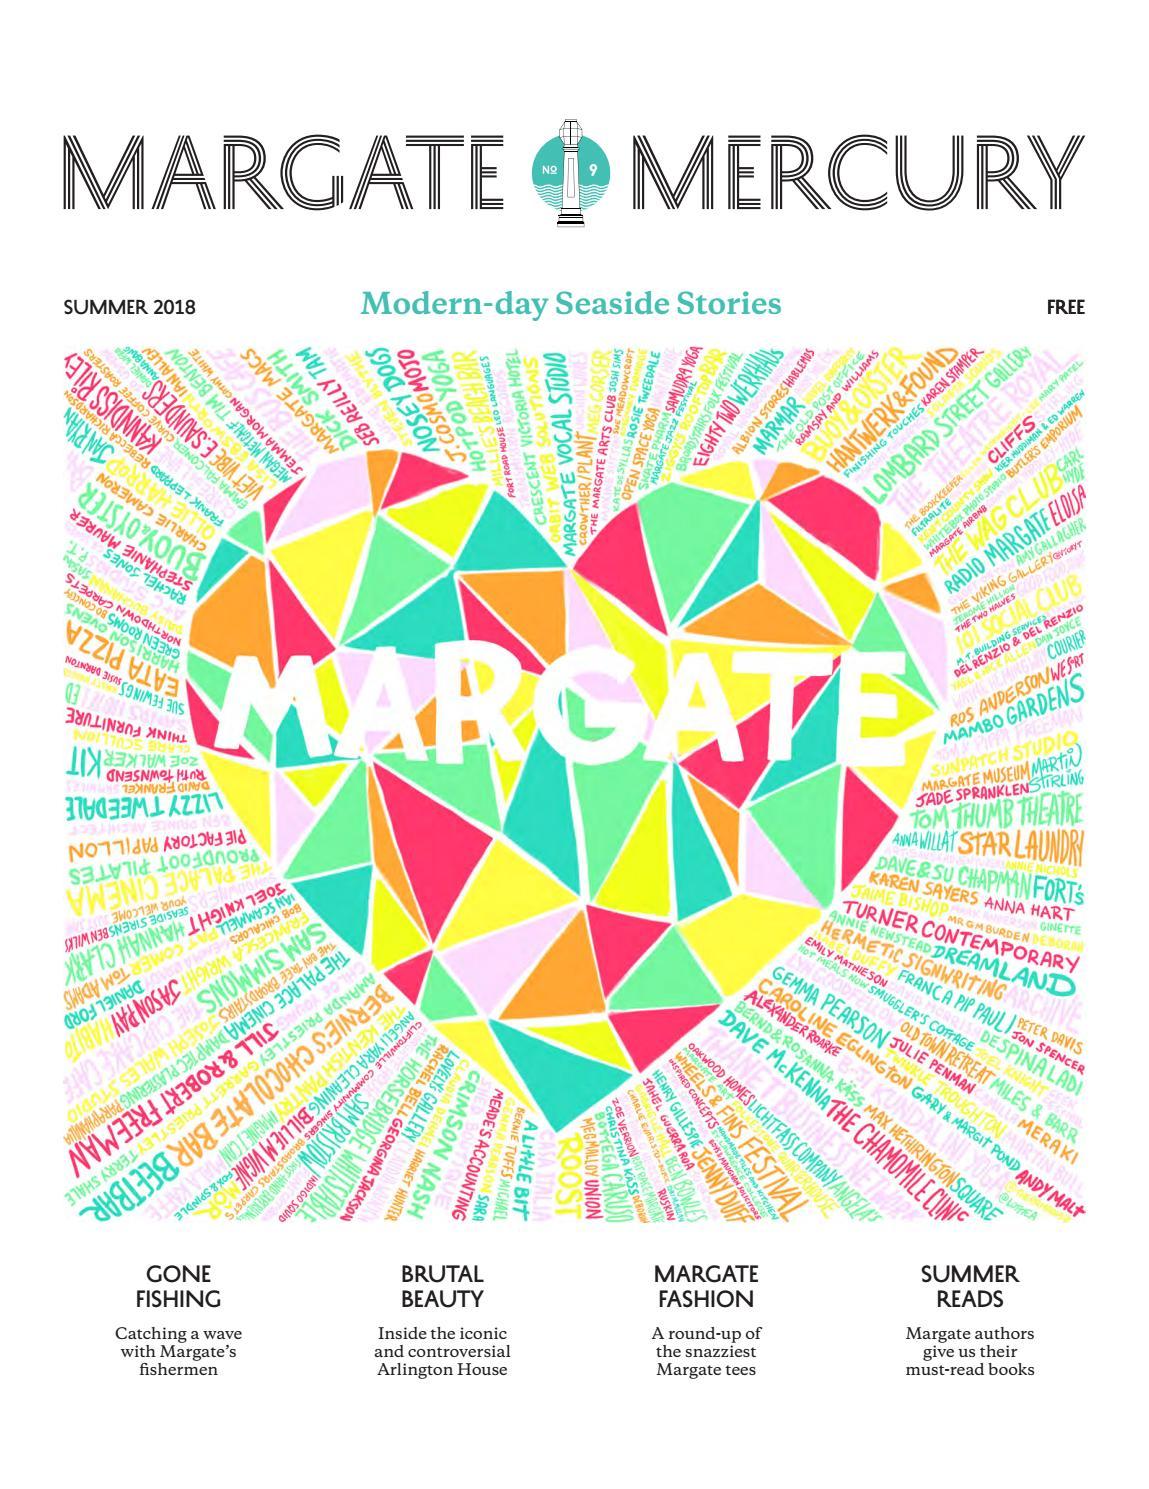 The Margate Mercury Summer 2018 By The Margate Mercury Issuu